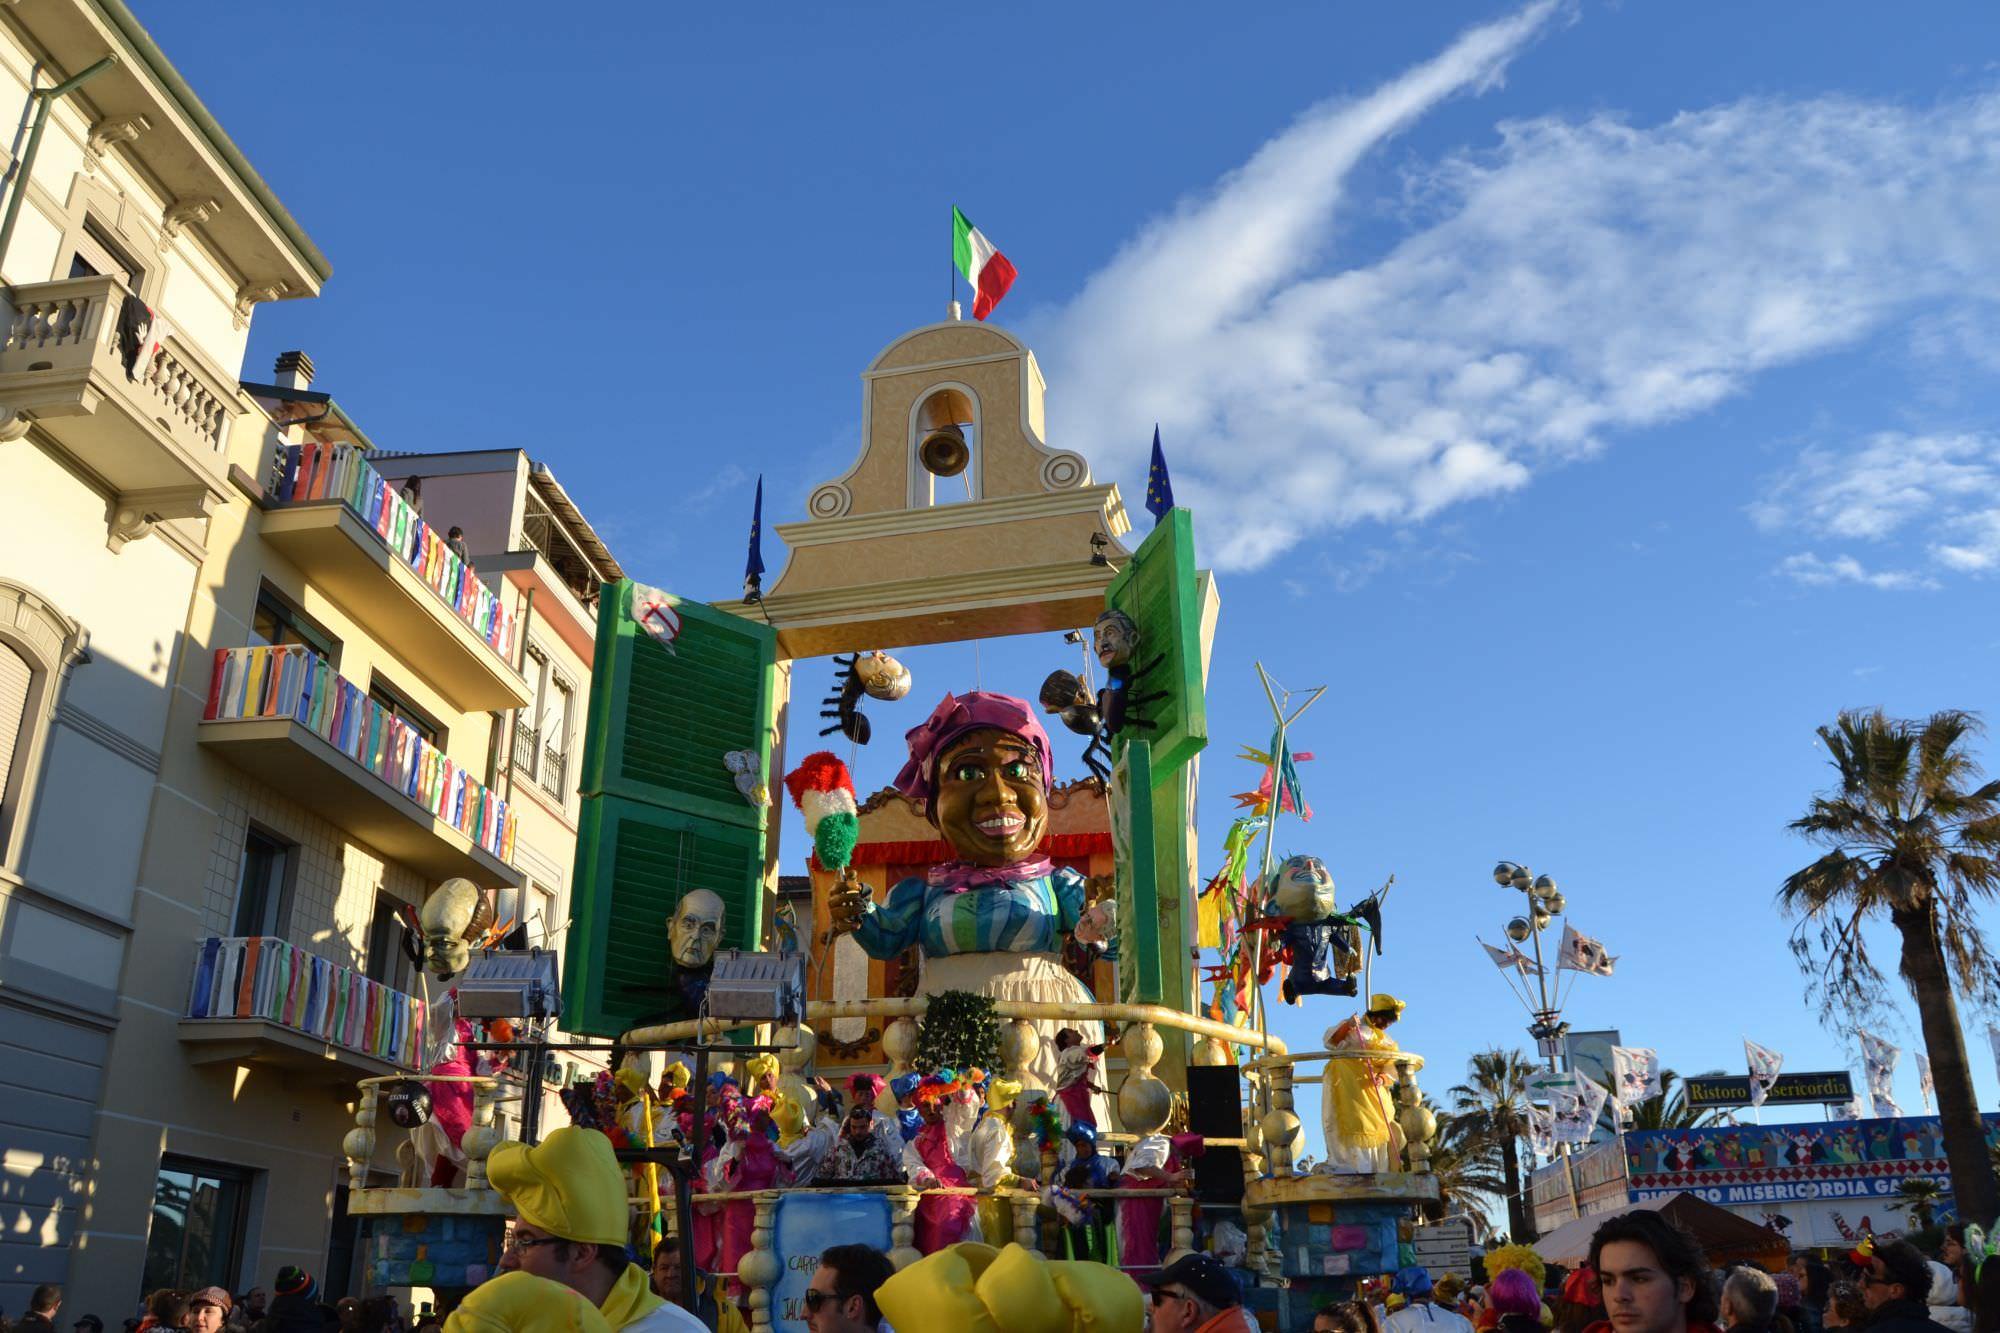 Carnevale allegrucci trionfa in seconda categoria - Aprite le finestre ...